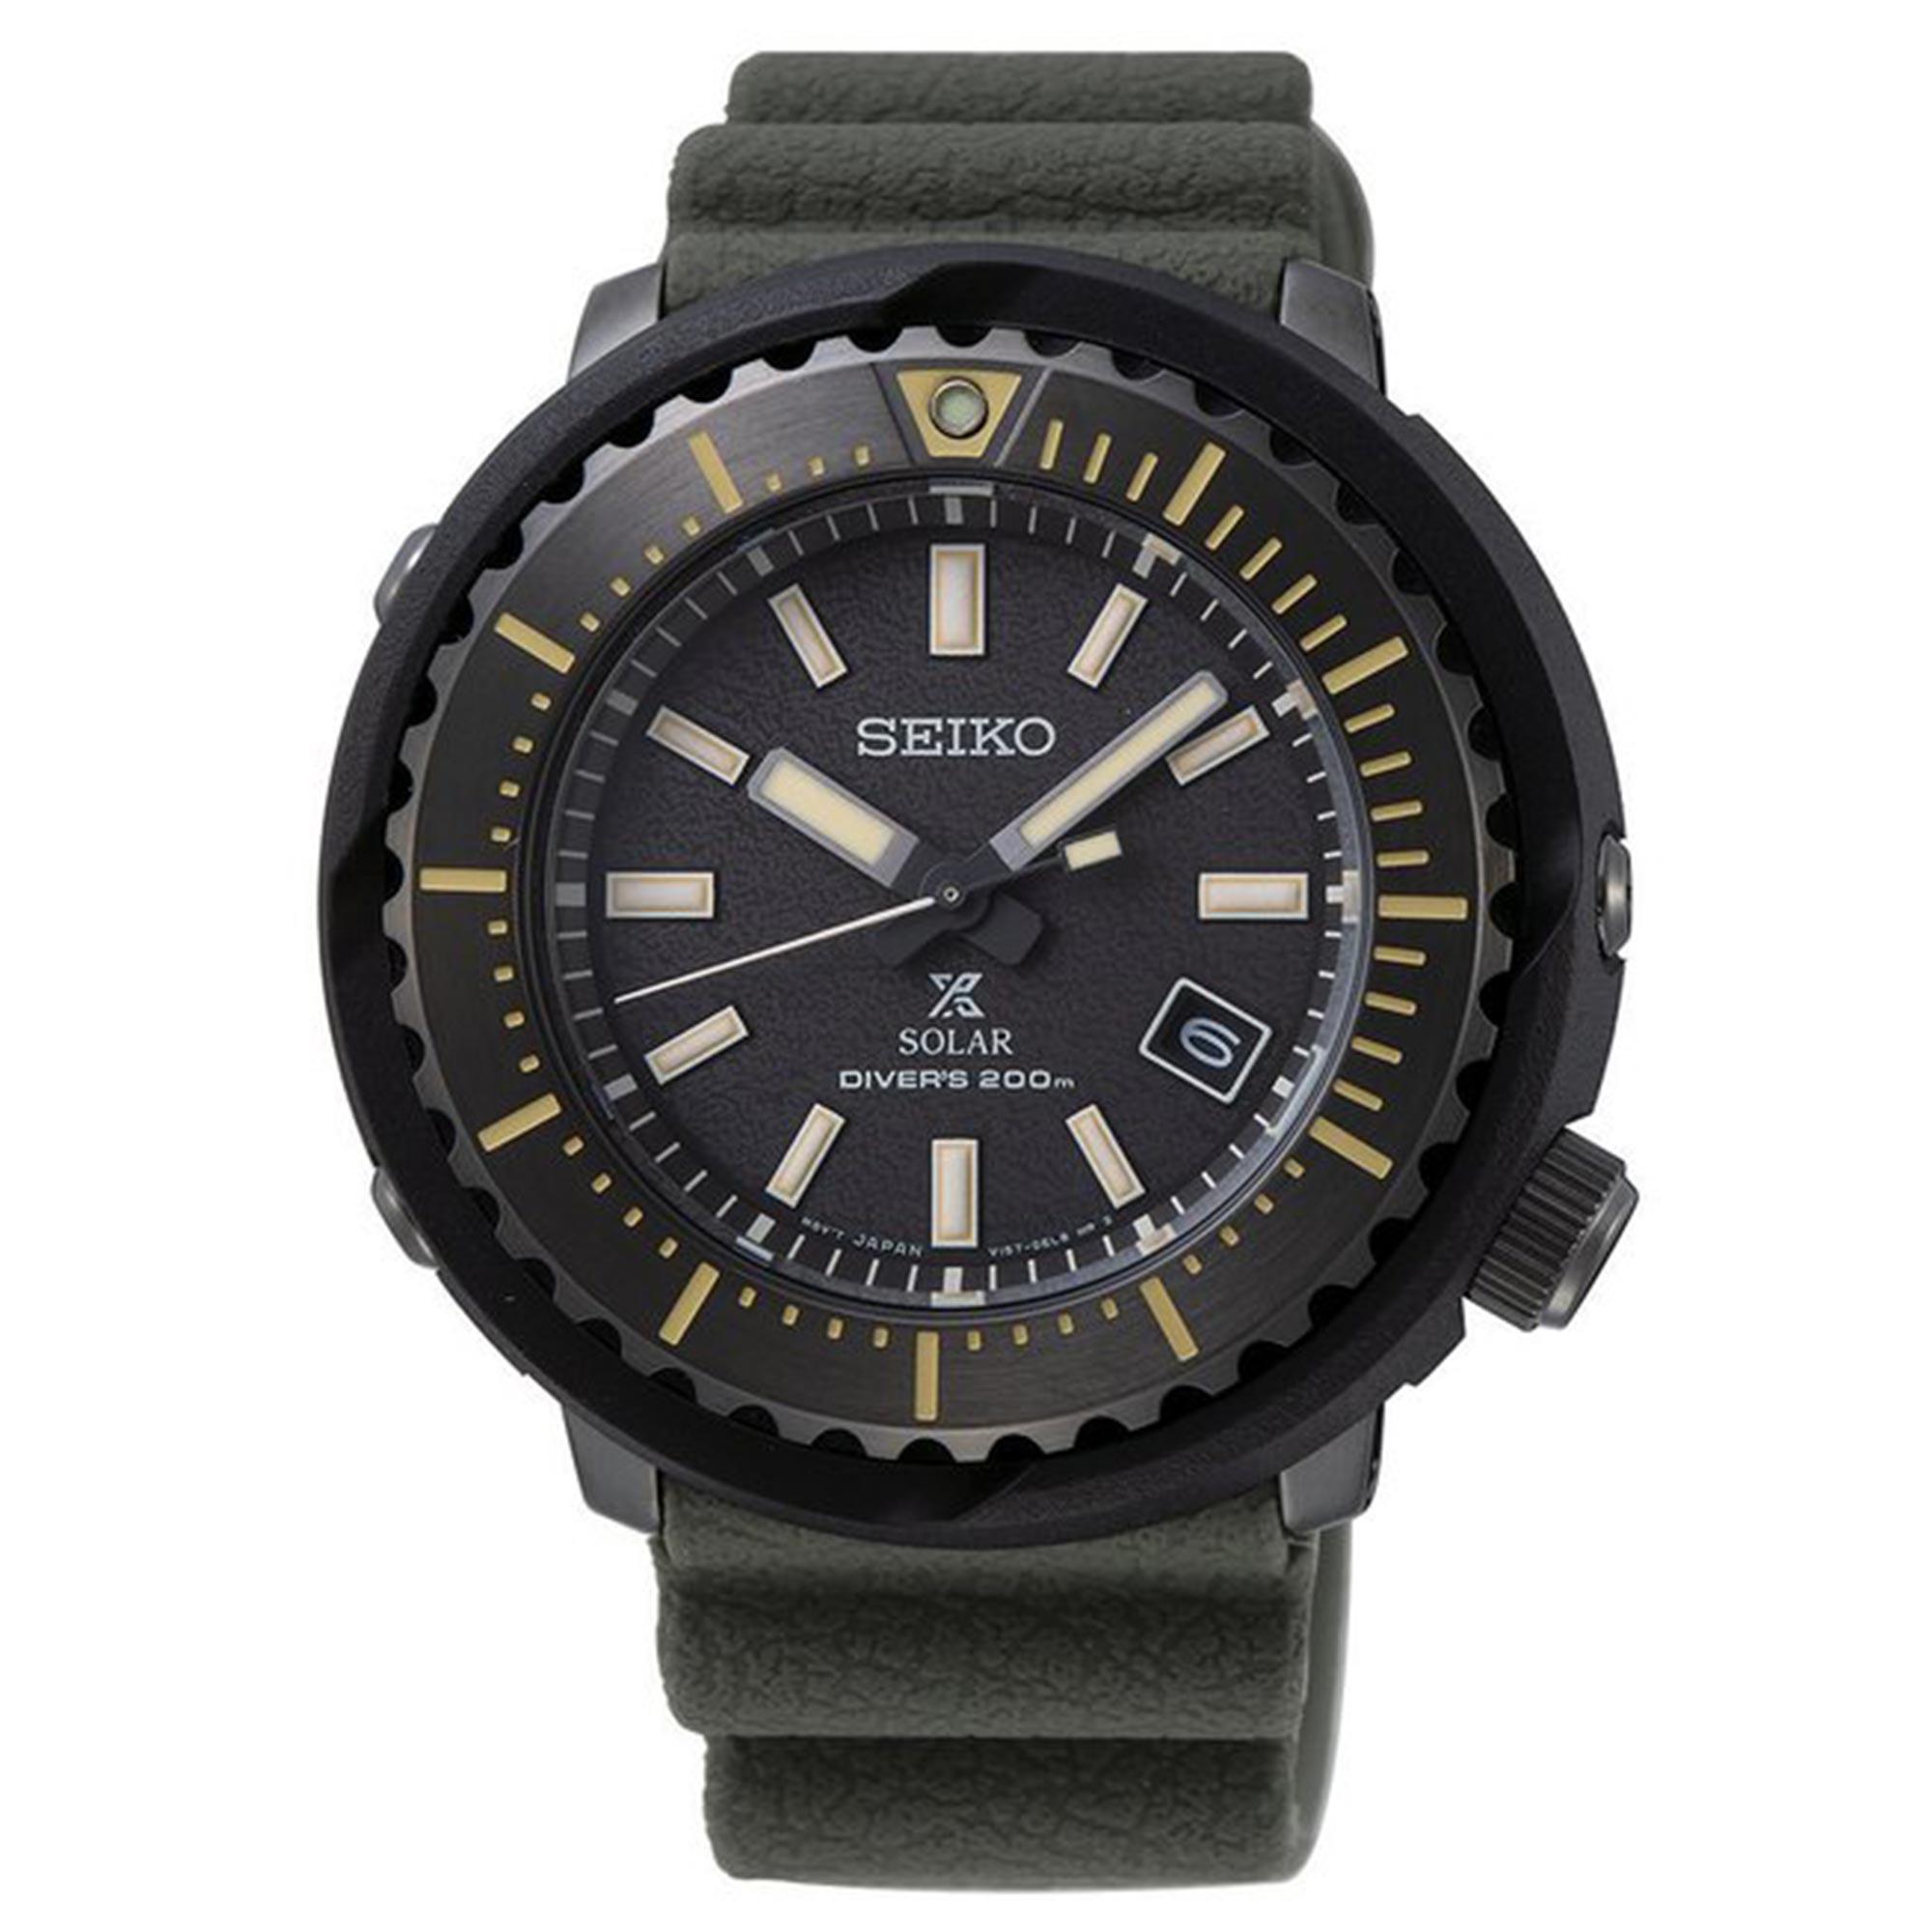 Seiko Prospex Street Series Solar Black Dial 'Tuna Case' Green Silicone Strap Men's Watch SNE543P1 RRP £370